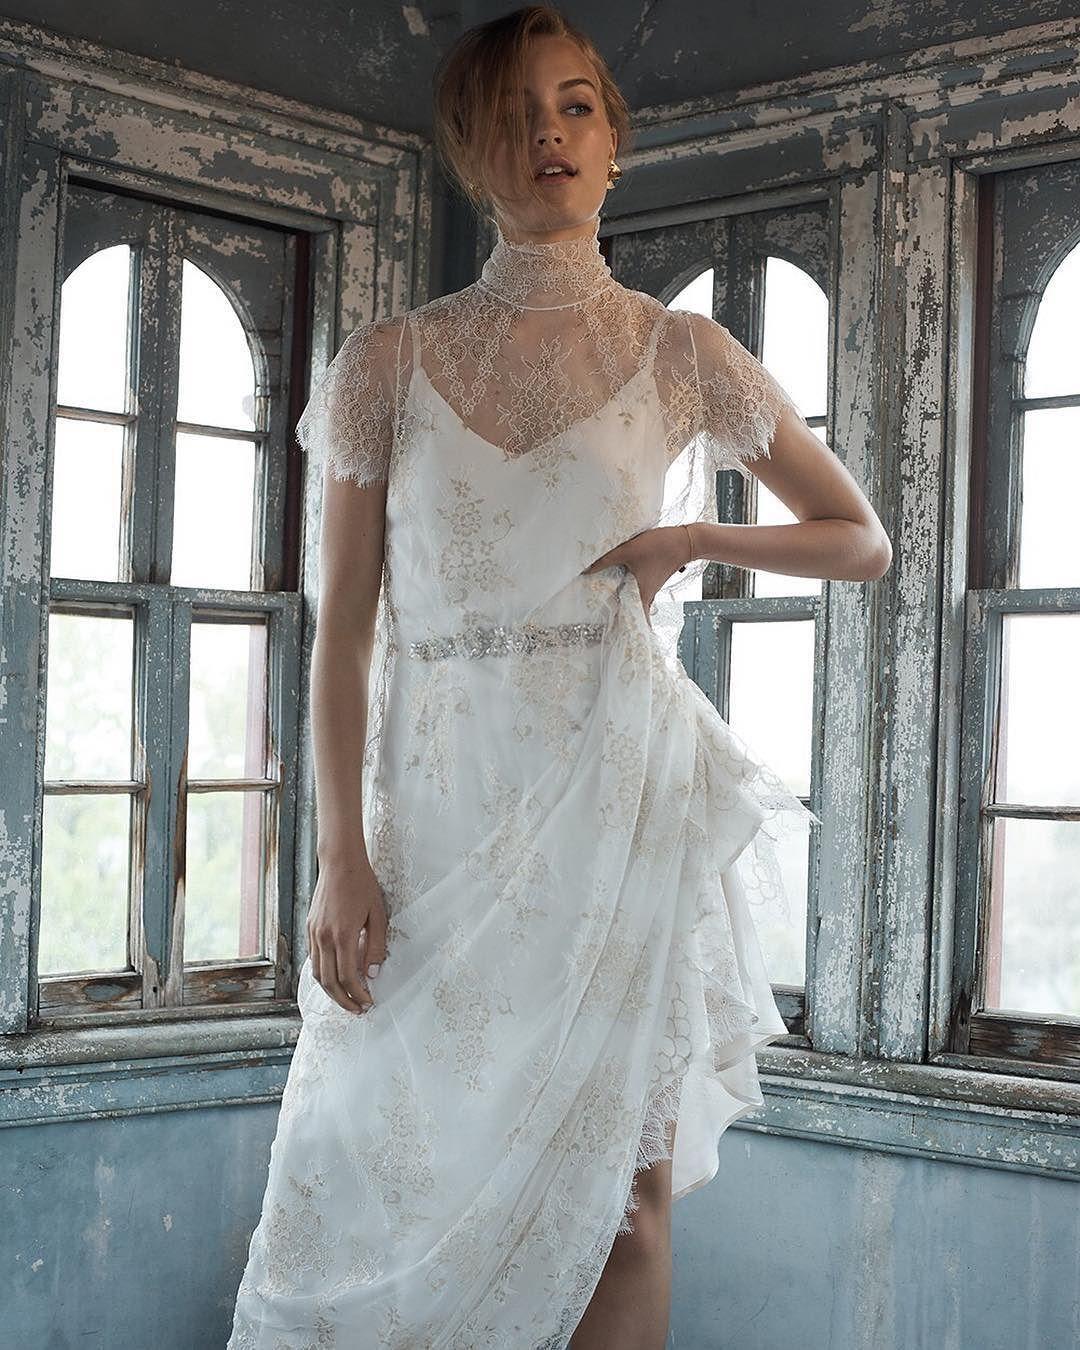 Anna Campbell 2019 Wedding Dresses: Make Instagram Shoppable - Curalate Like2Buy【2019】